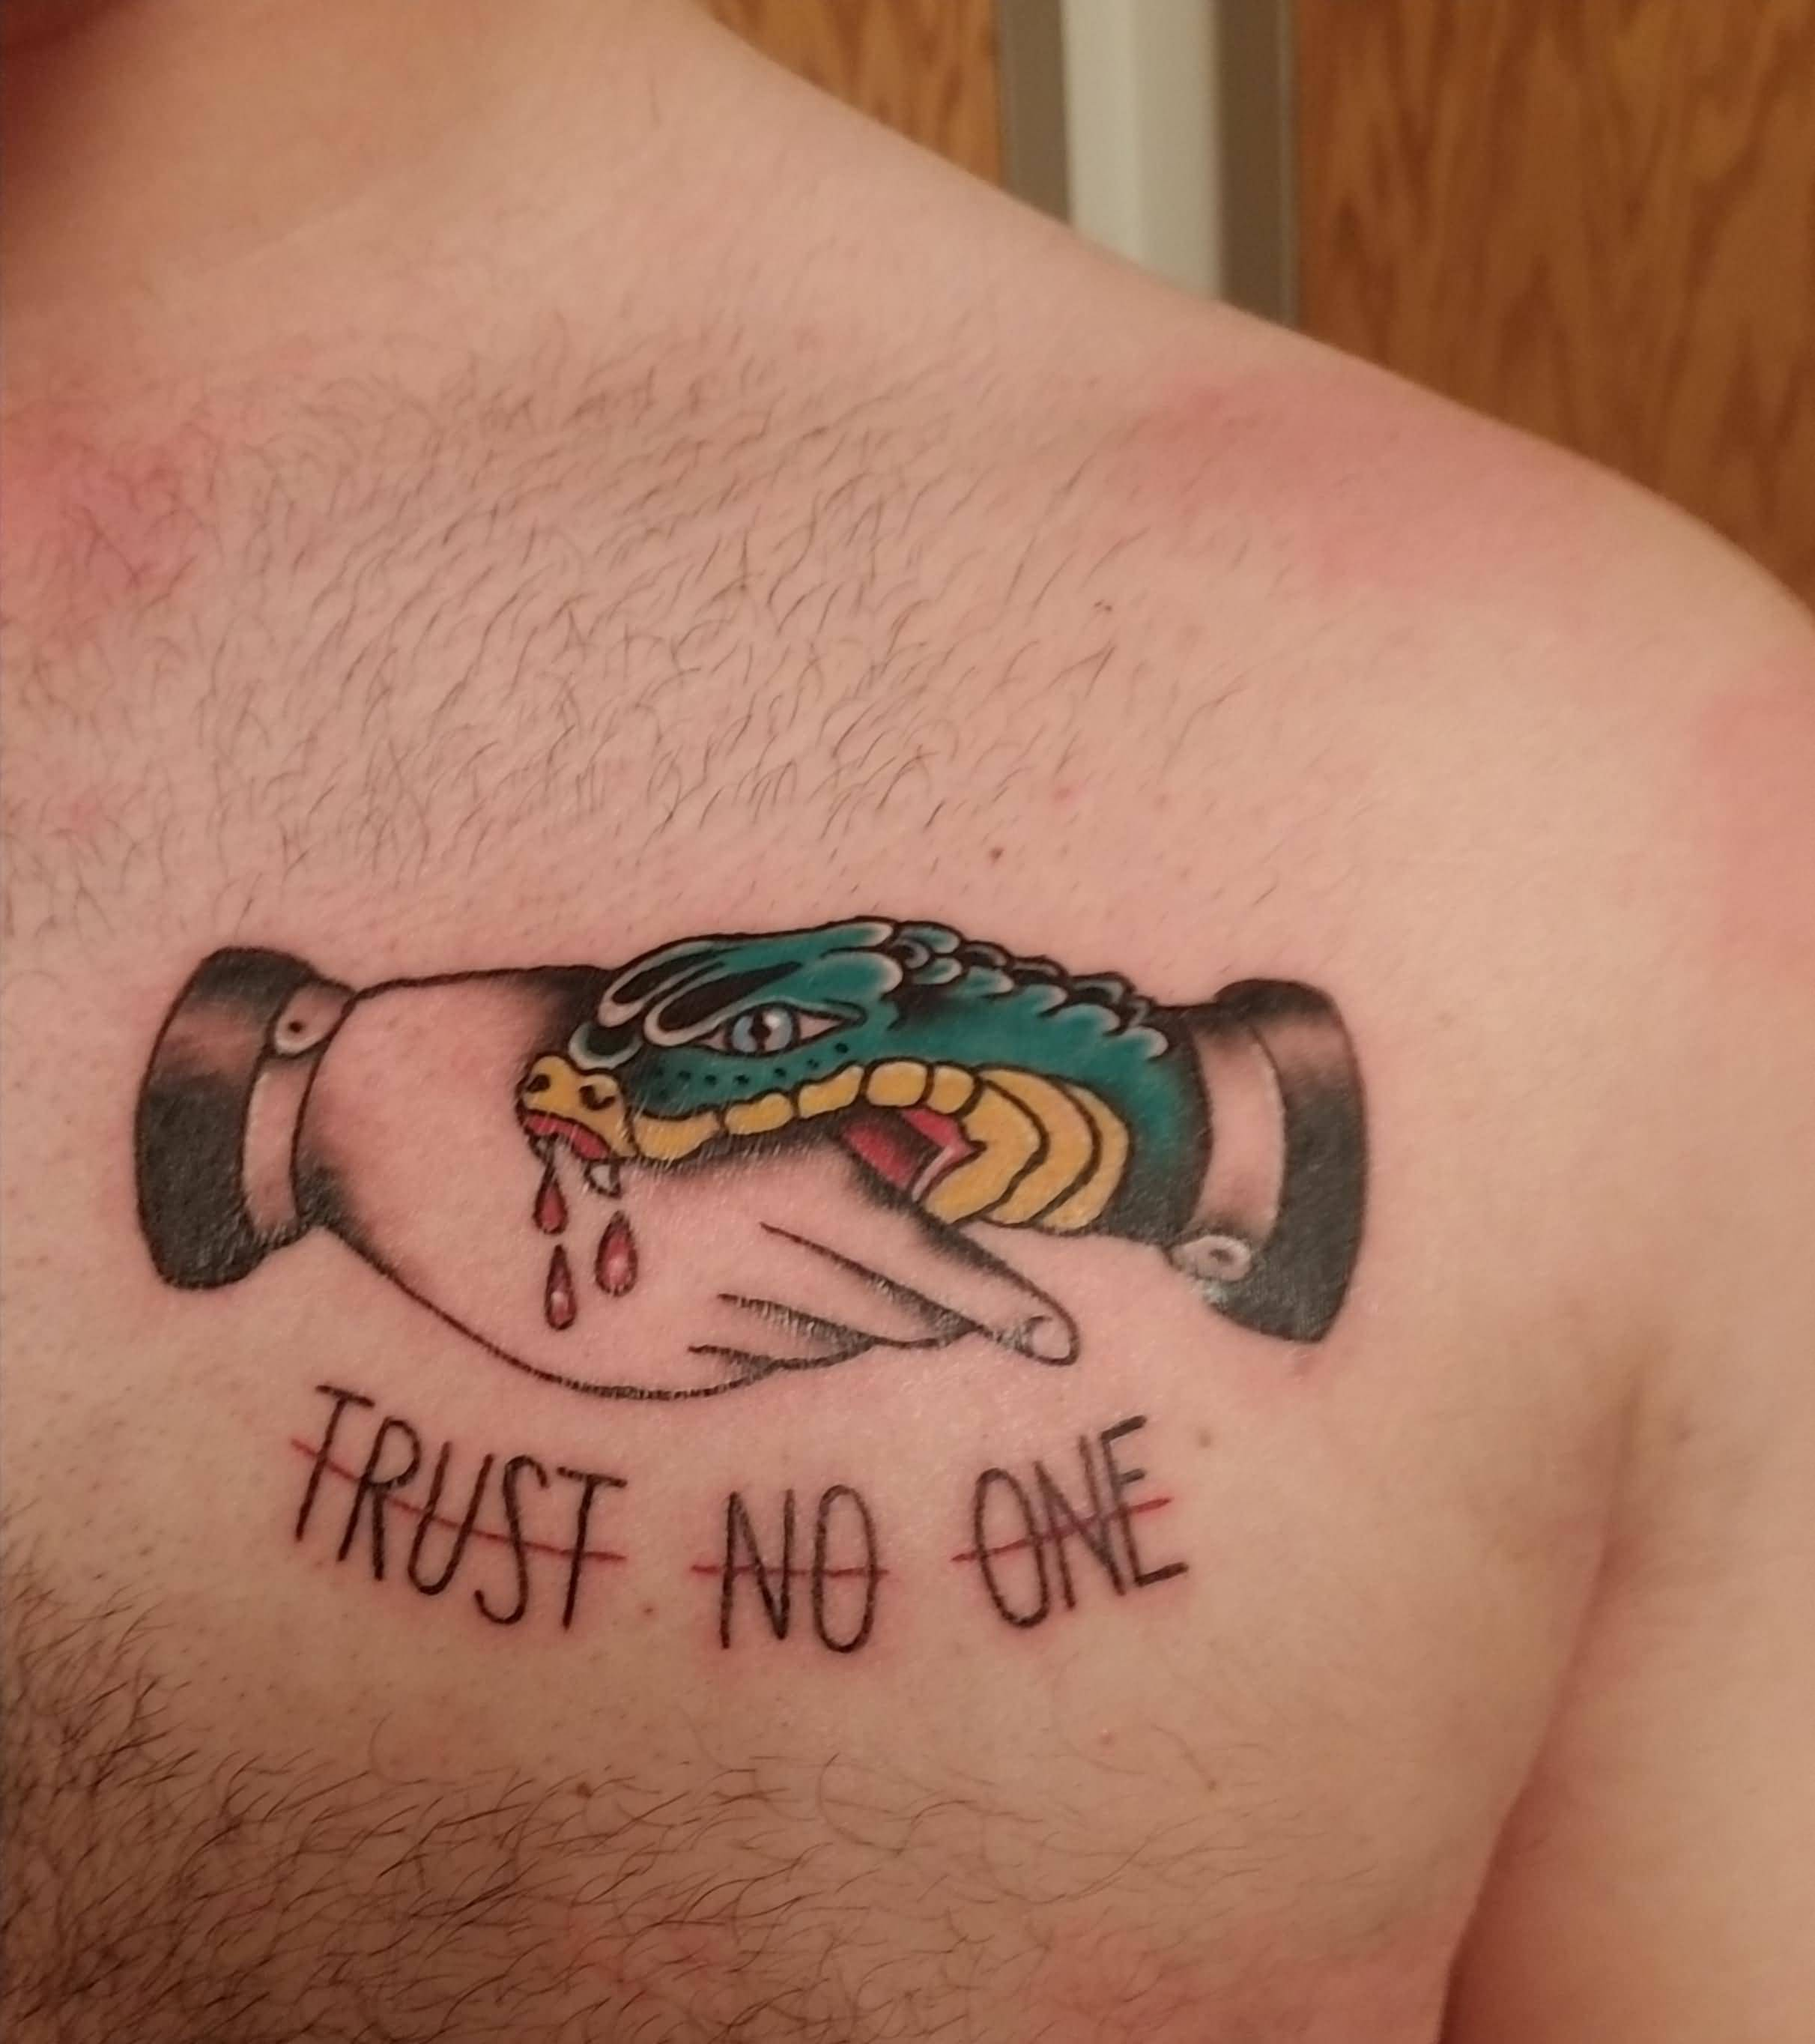 Trust No One Tattoo Designs